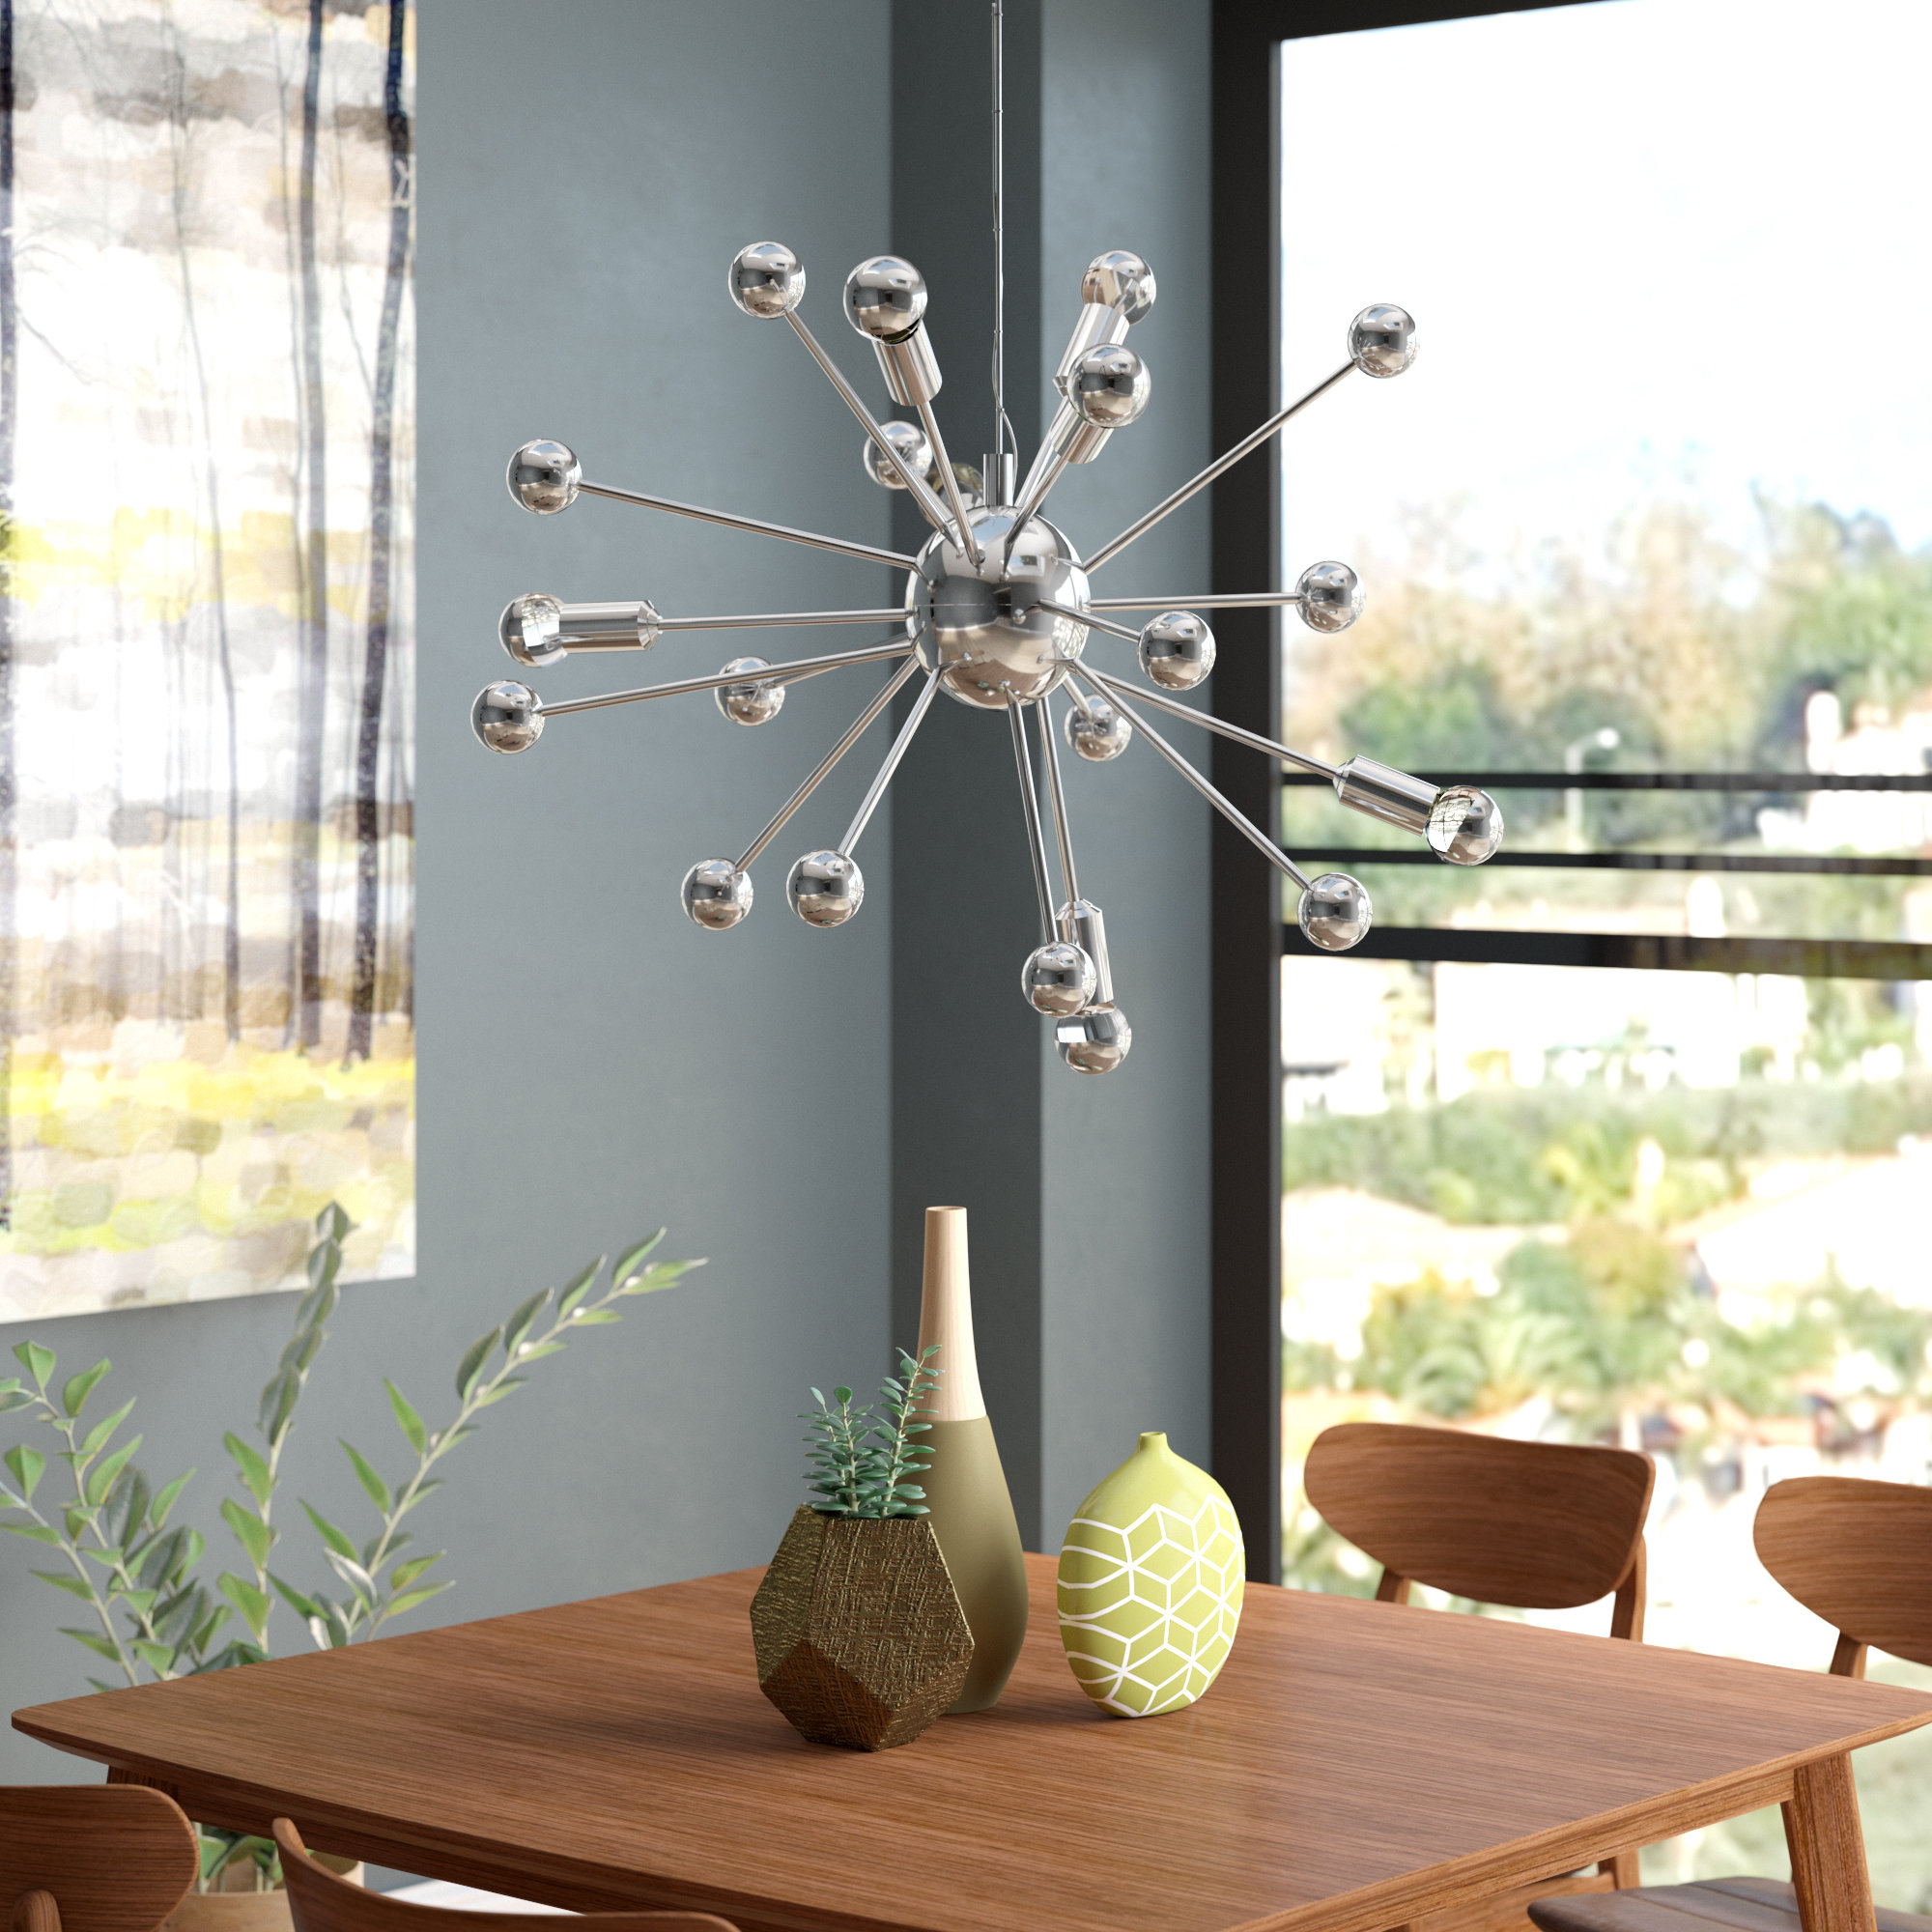 Bacchus 12-Light Sputnik Chandelier throughout Corona 12-Light Sputnik Chandeliers (Image 6 of 30)